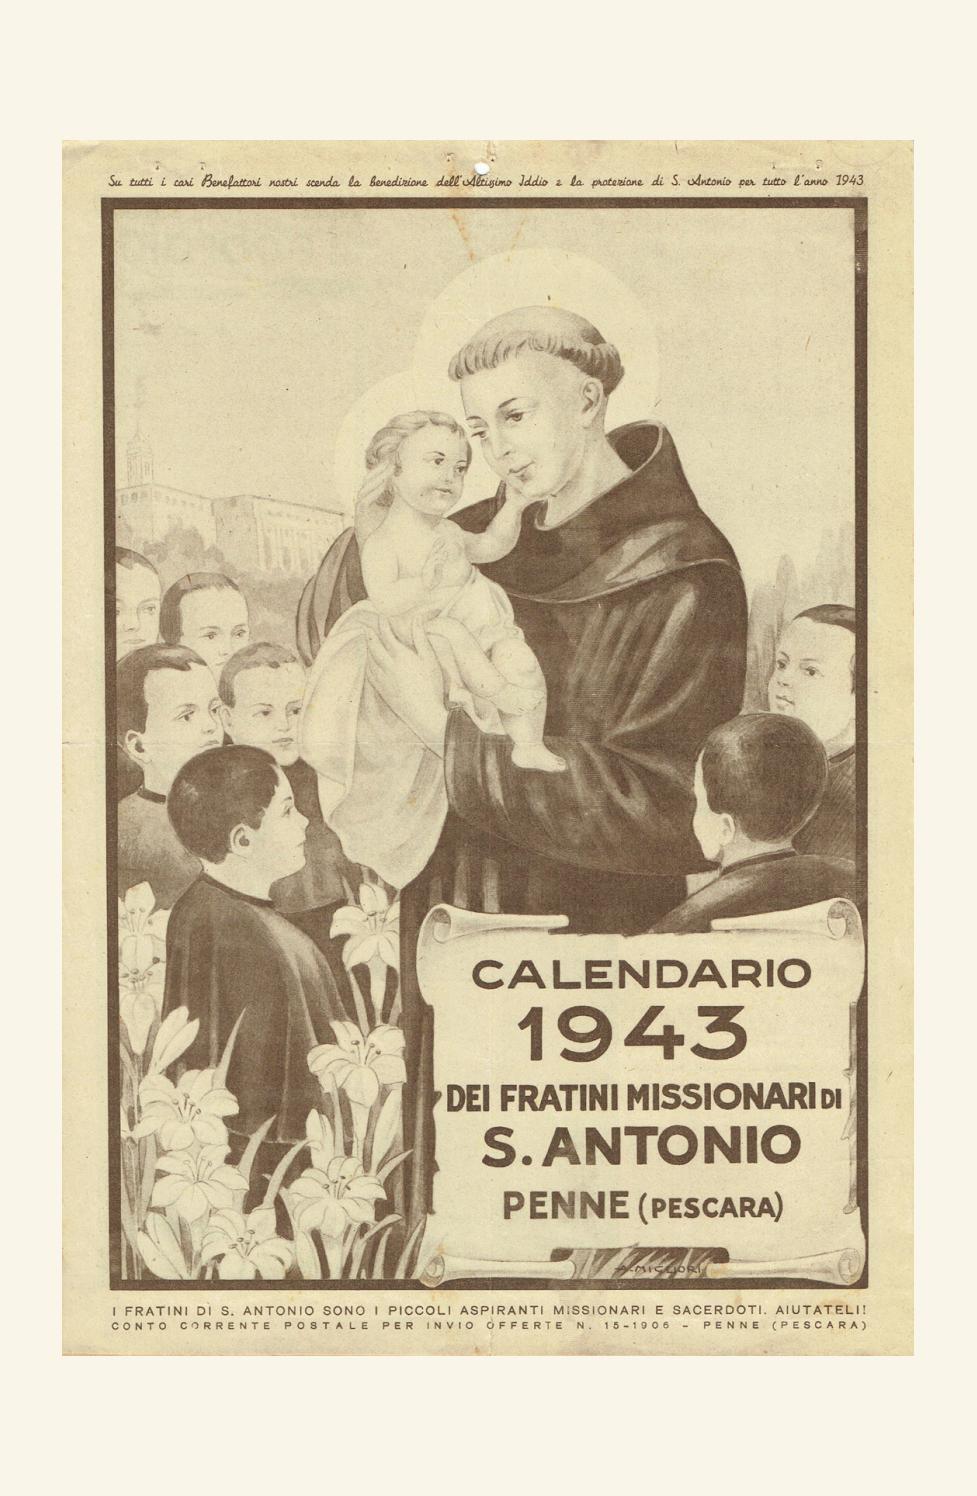 Calendario 1906.Voce Serafica Calendario 1943 By Padreurbano Issuu